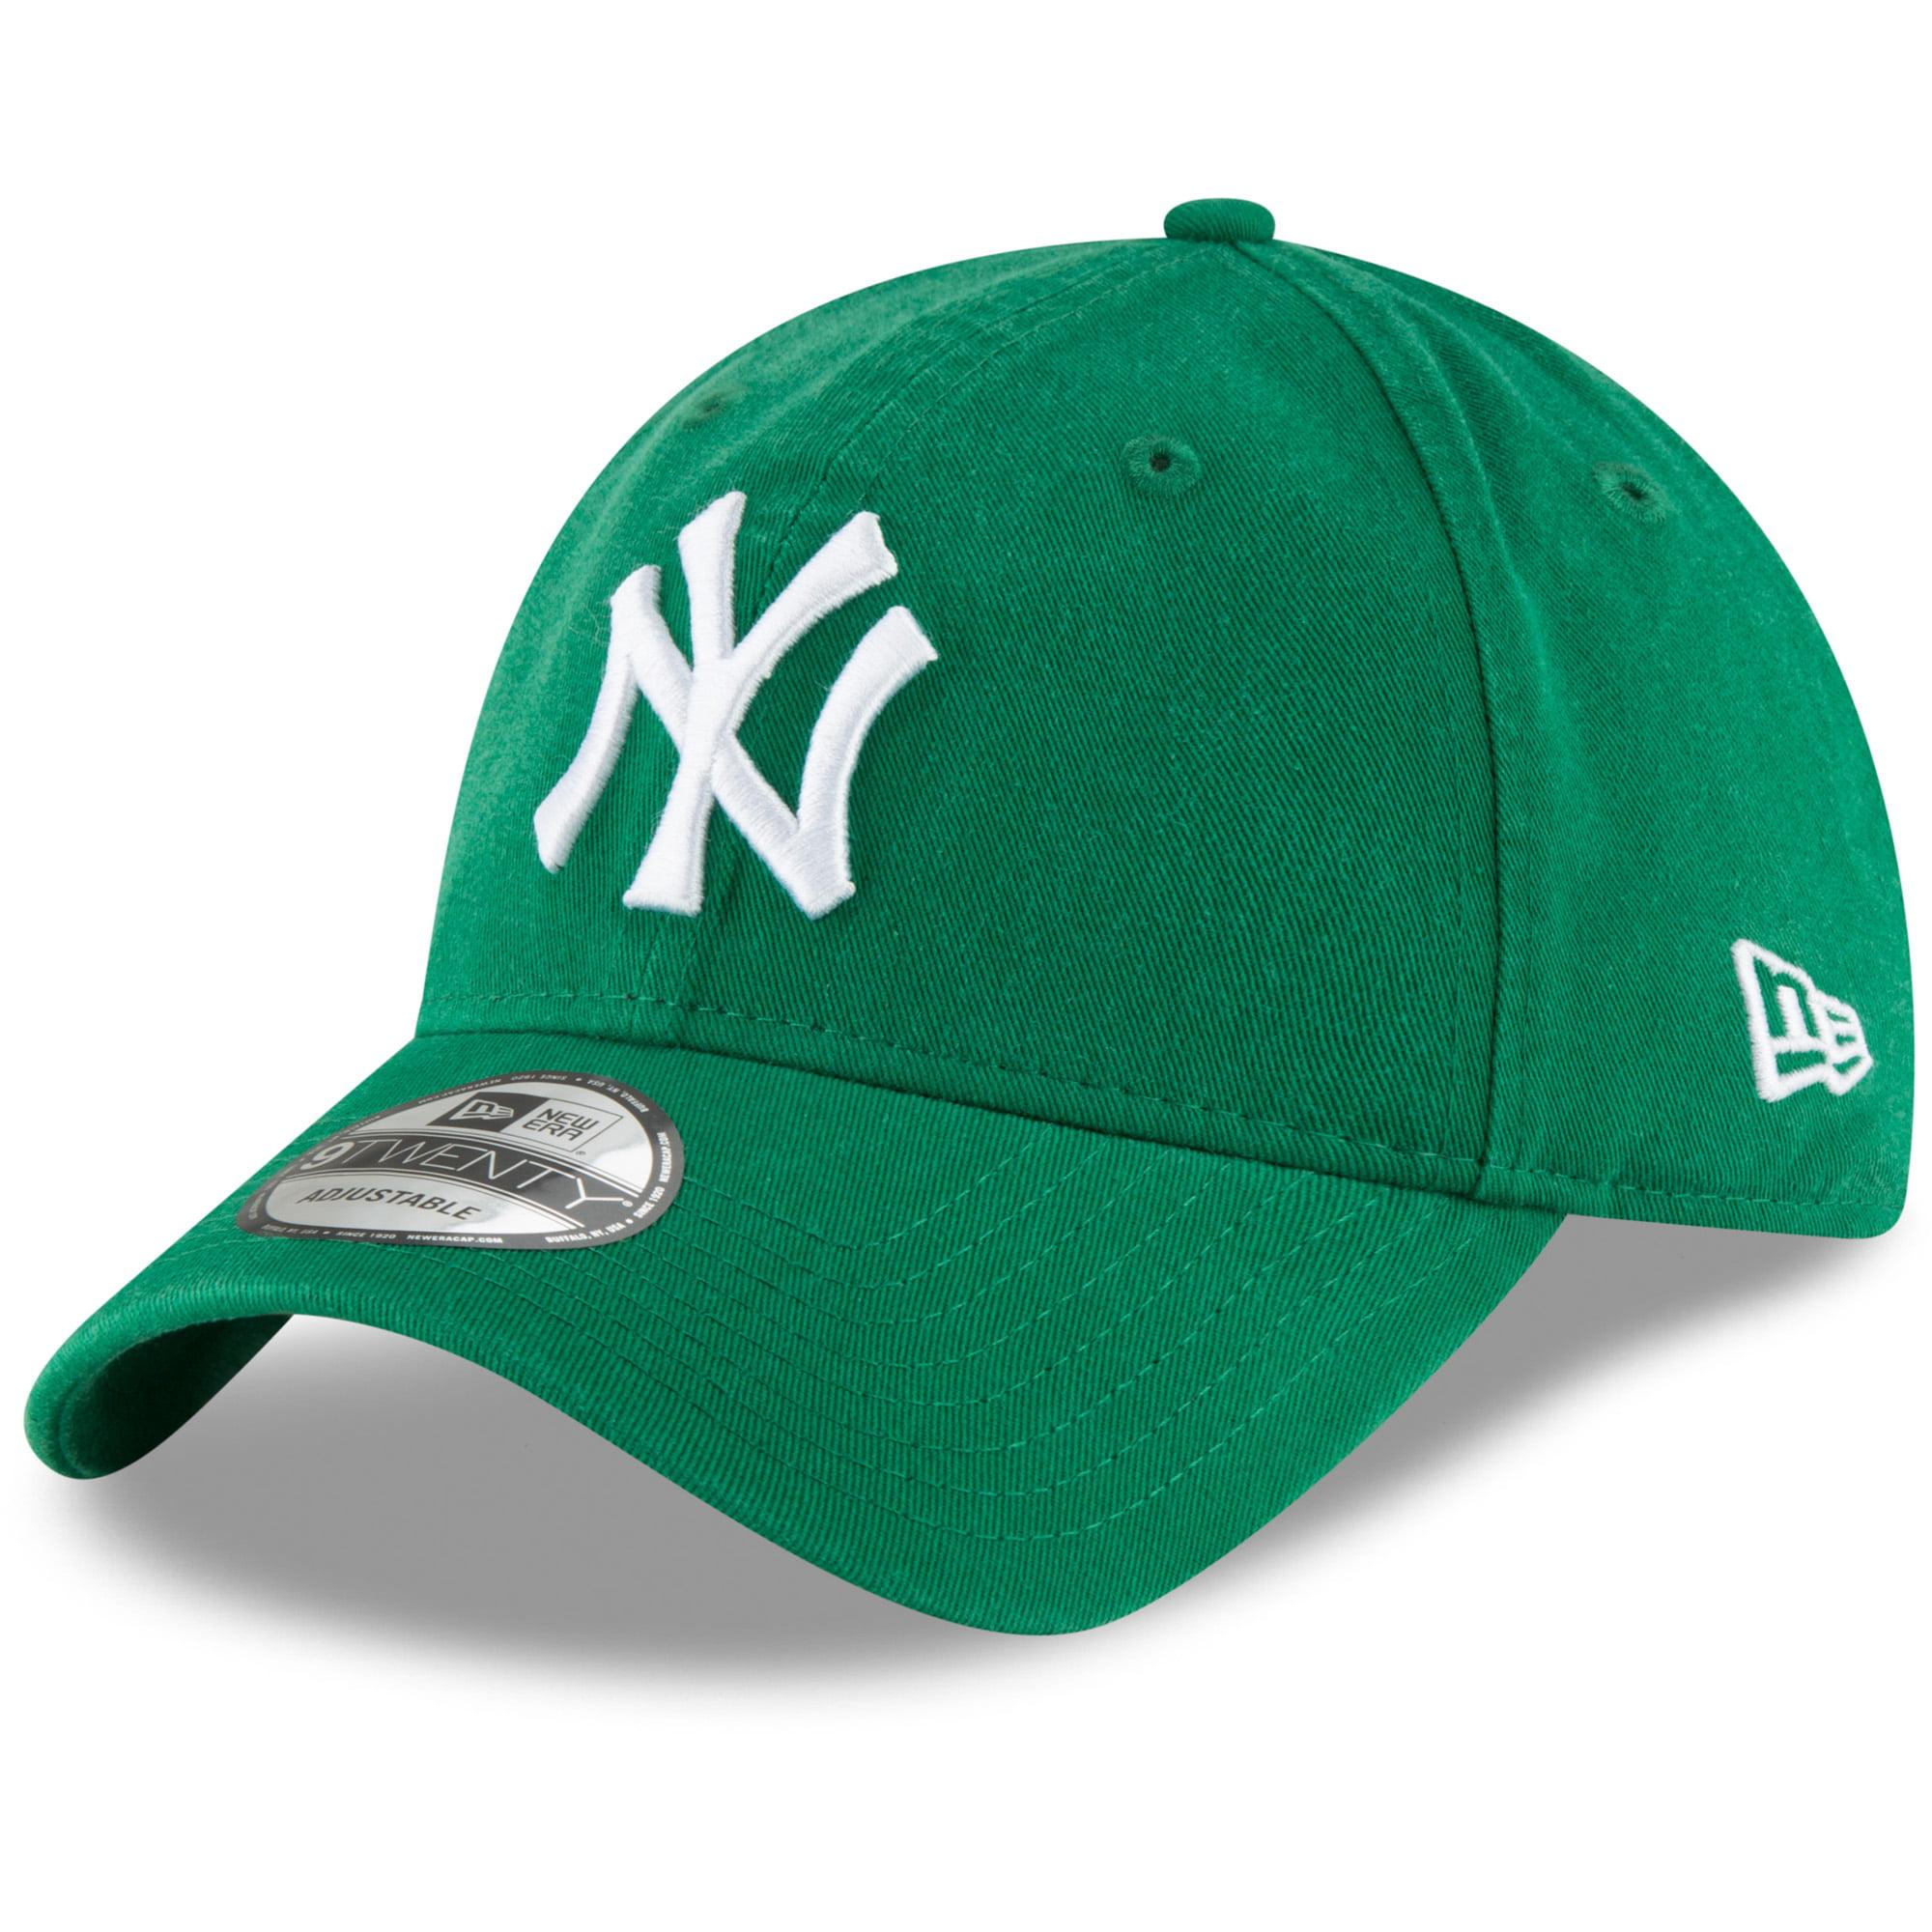 New York Yankees New Era Core Classic Secondary 9TWENTY Adjustable Hat - Kelly Green - OSFA